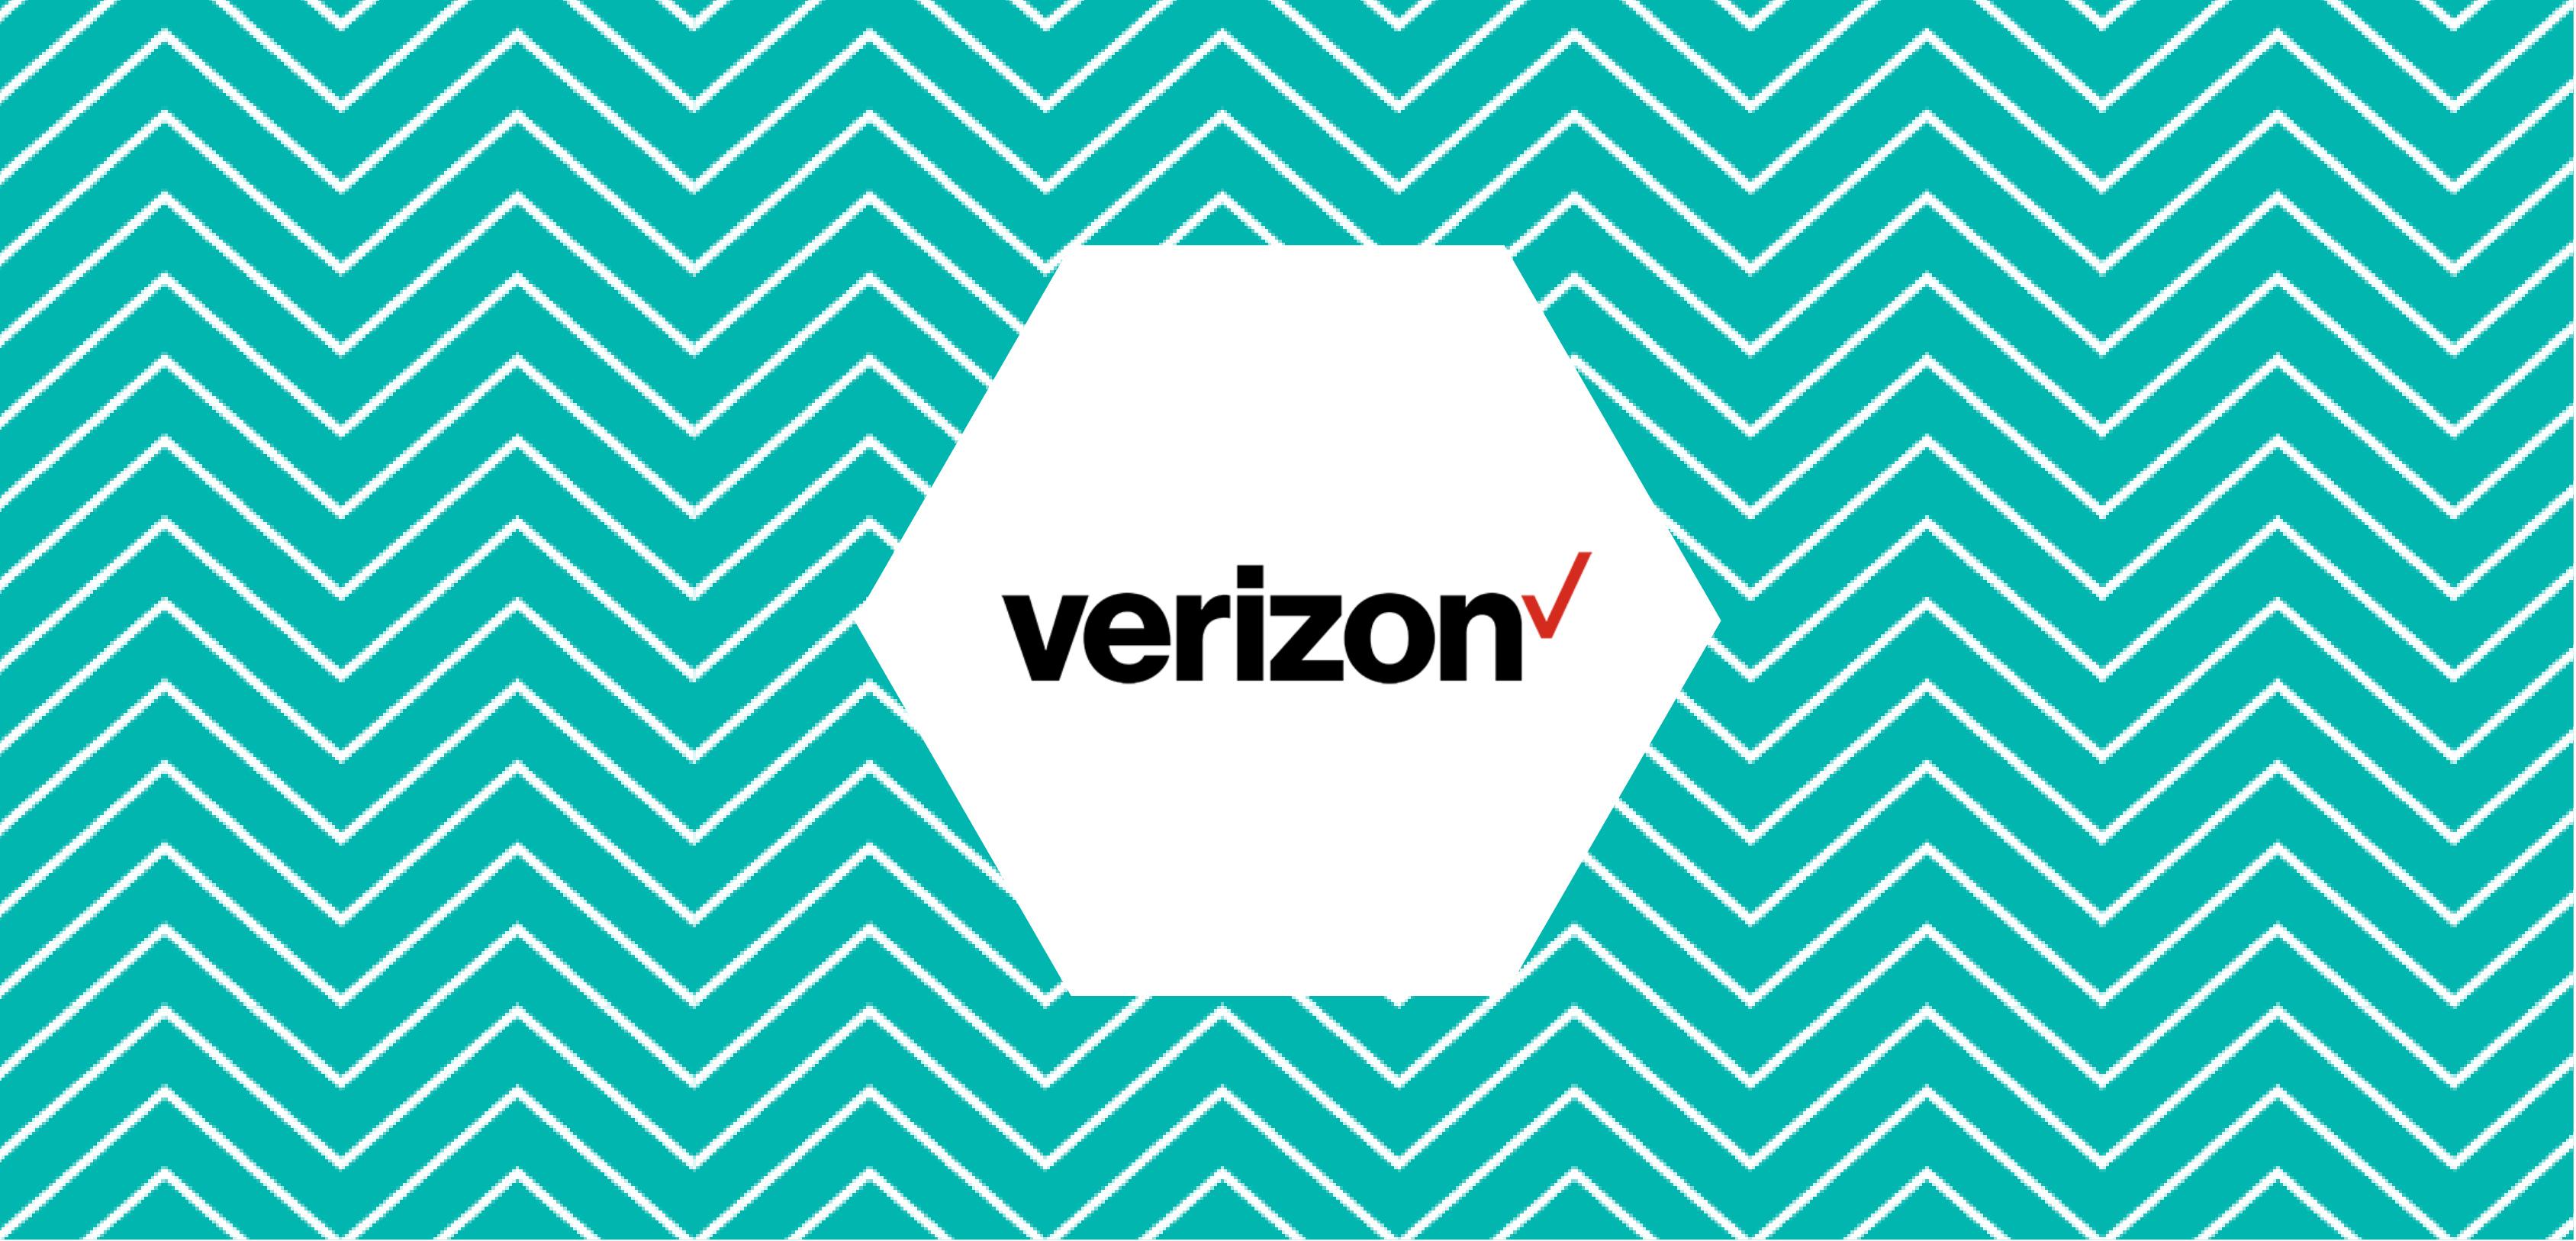 Verizon Sherpa work case study graphic